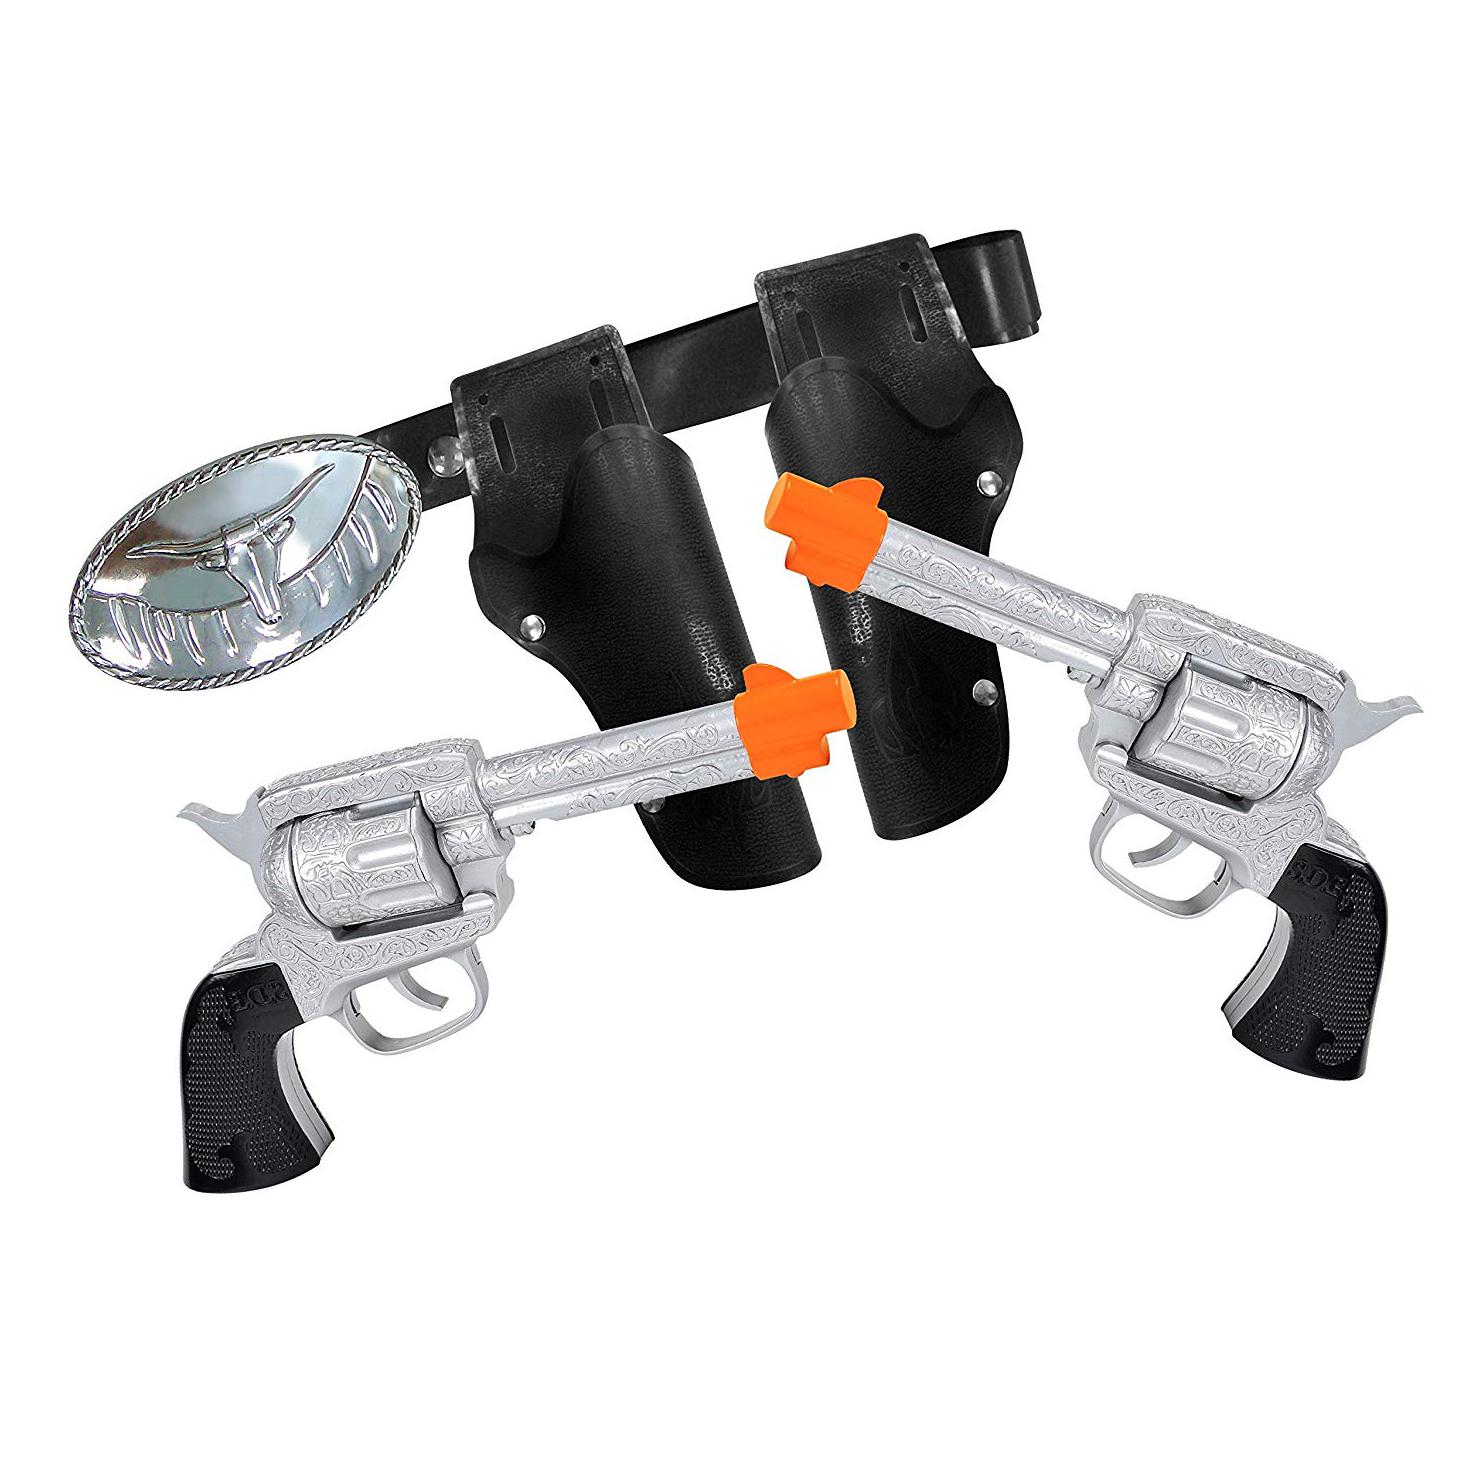 Maxx Action Cap Pistol Combo